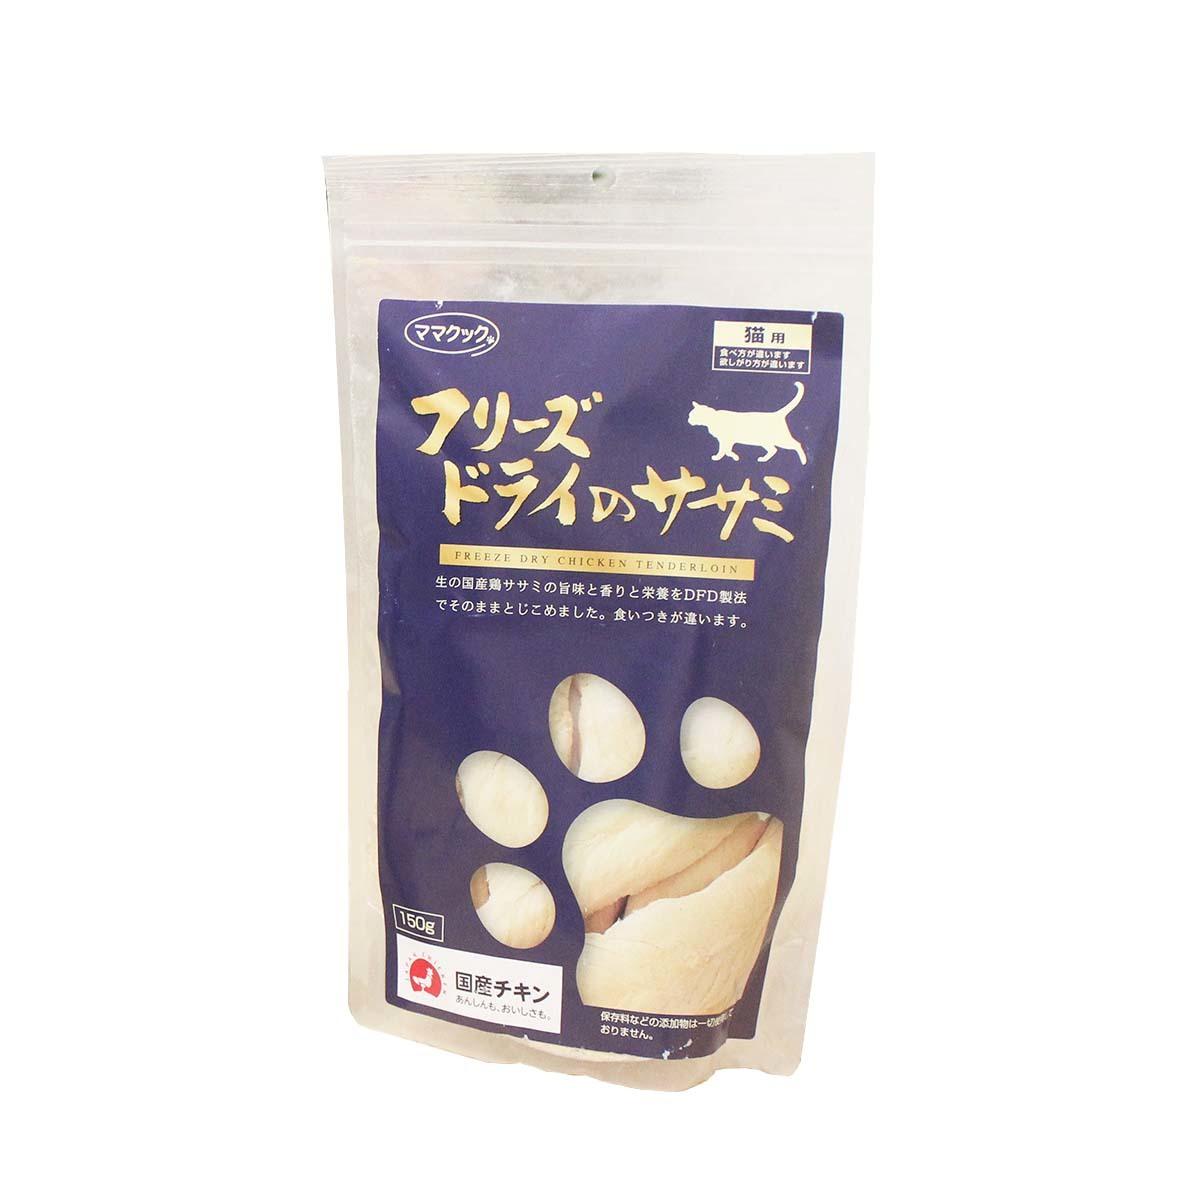 Japan Freeze Dried Chicken Tenderloin Snack for Cats (Parallel Import Goods)